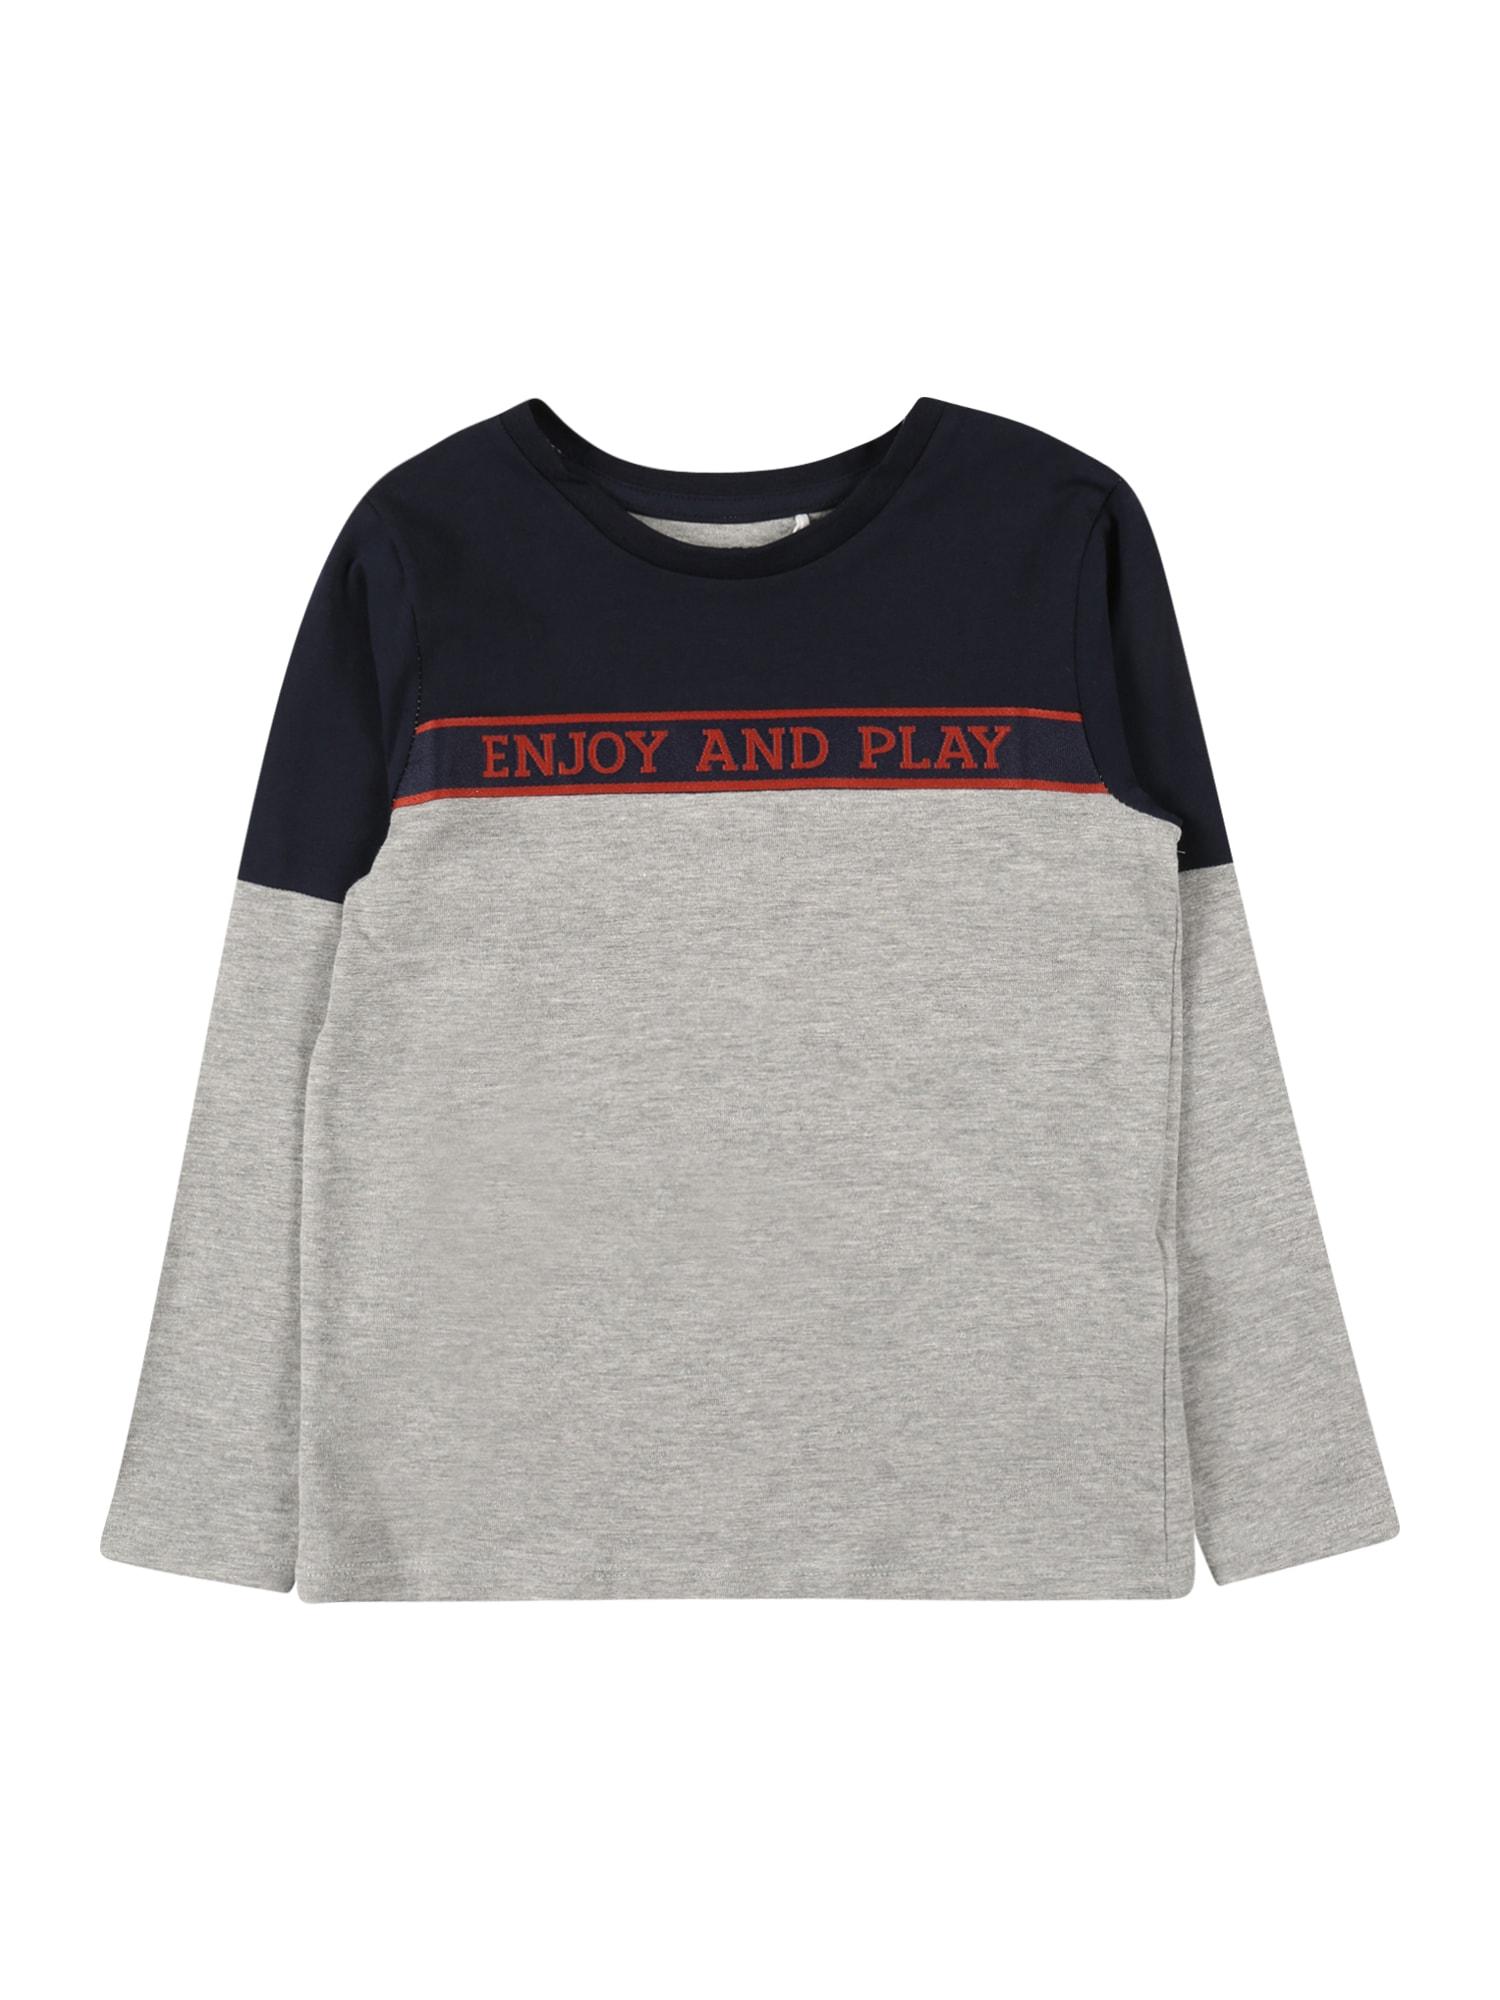 NAME IT Tričko 'NAPLAY'  šedý melír / červená / námořnická modř